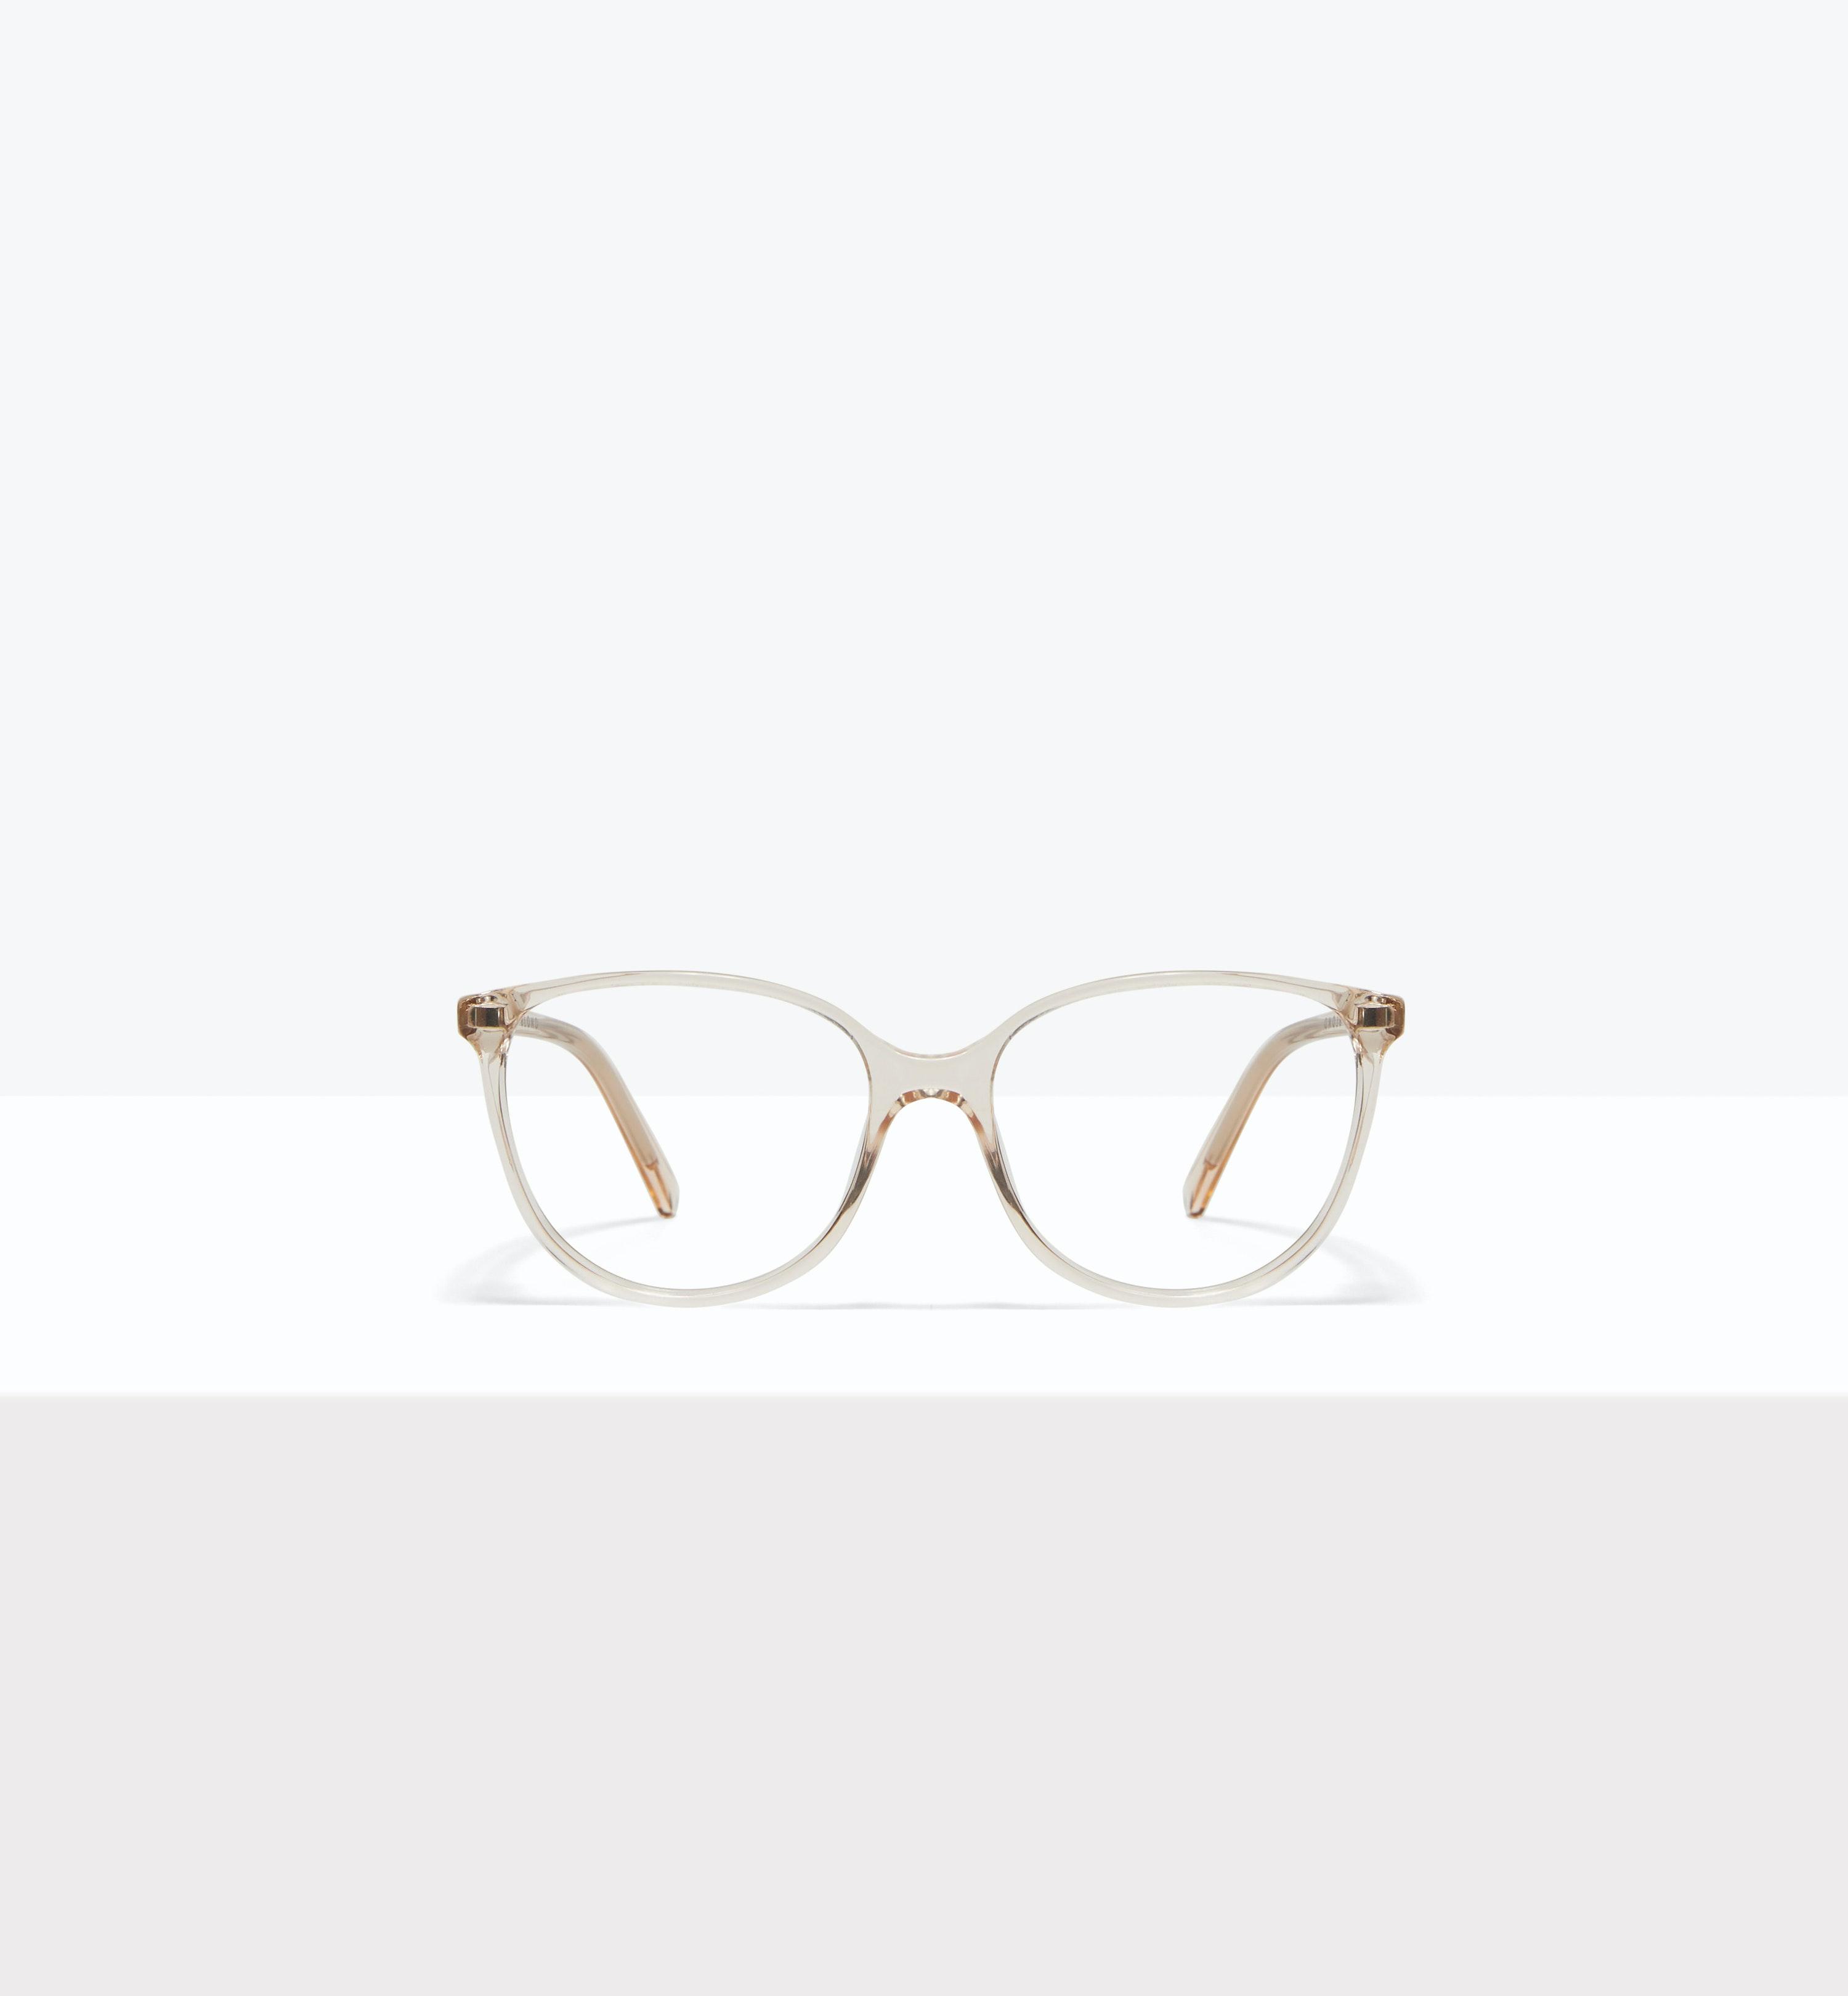 Affordable Fashion Glasses Cat Eye Eyeglasses Women Imagine Petite Blond